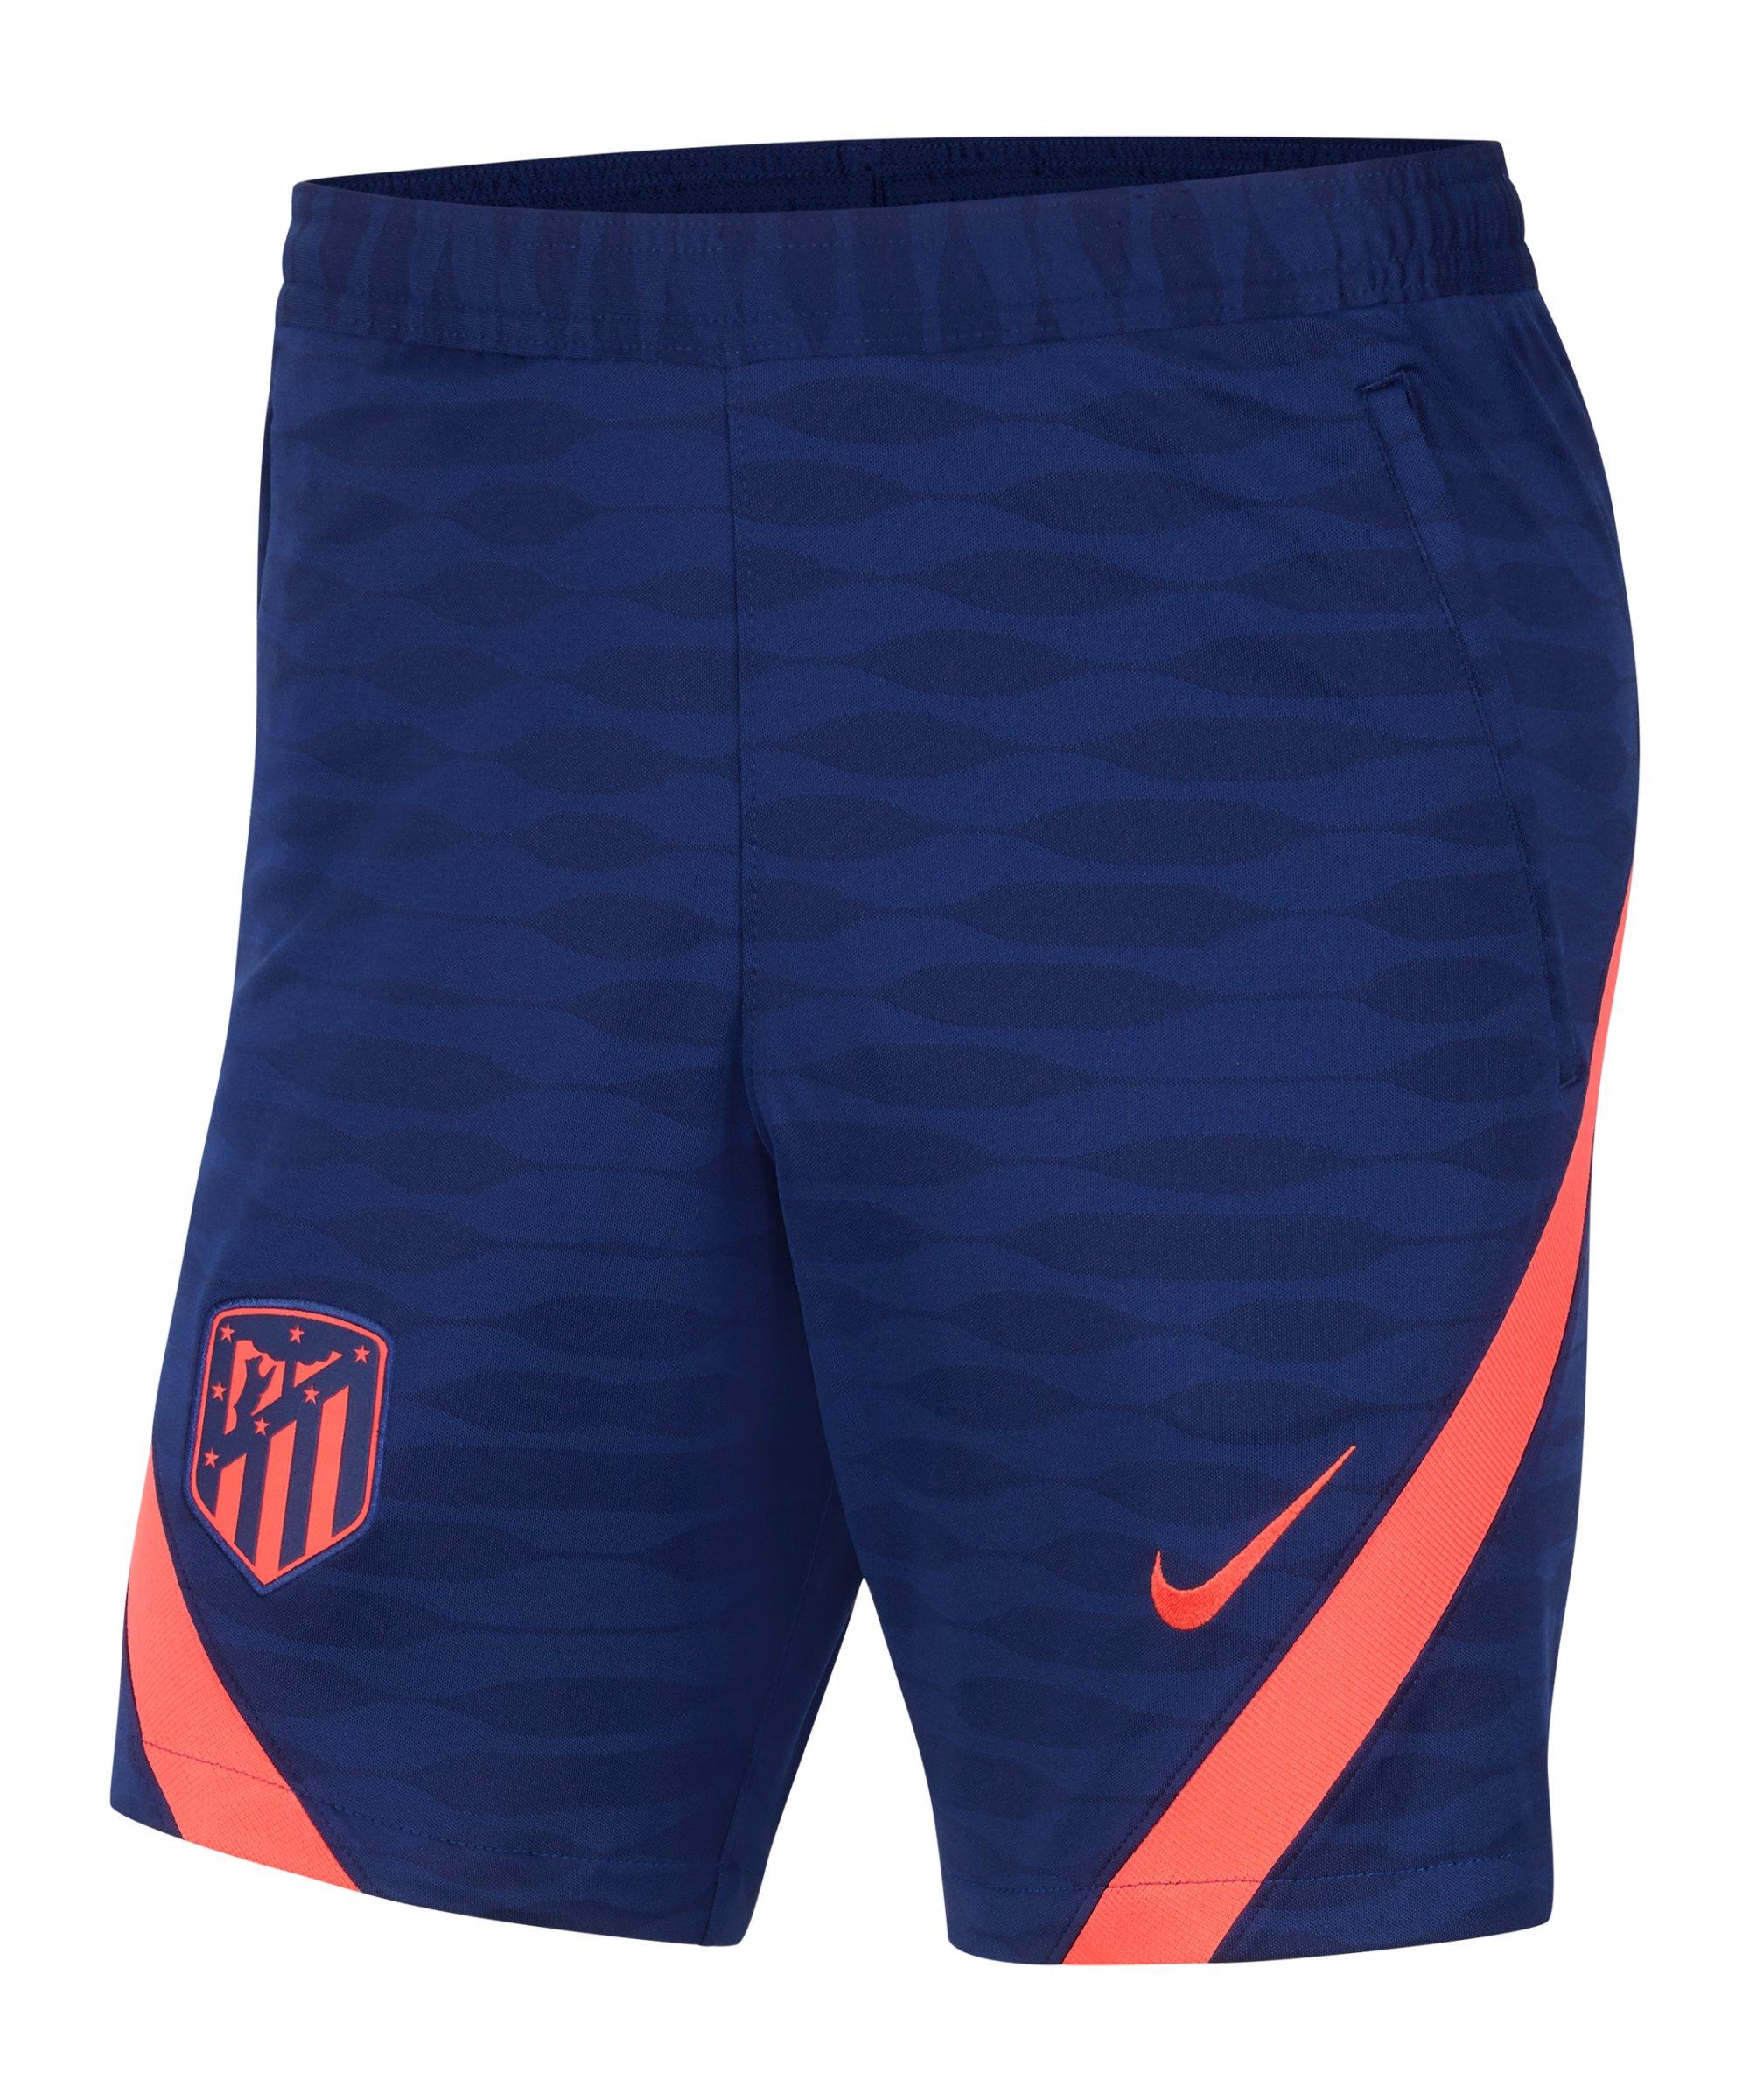 Nike Atletico Madrid Strike Short Blau F421 - blau